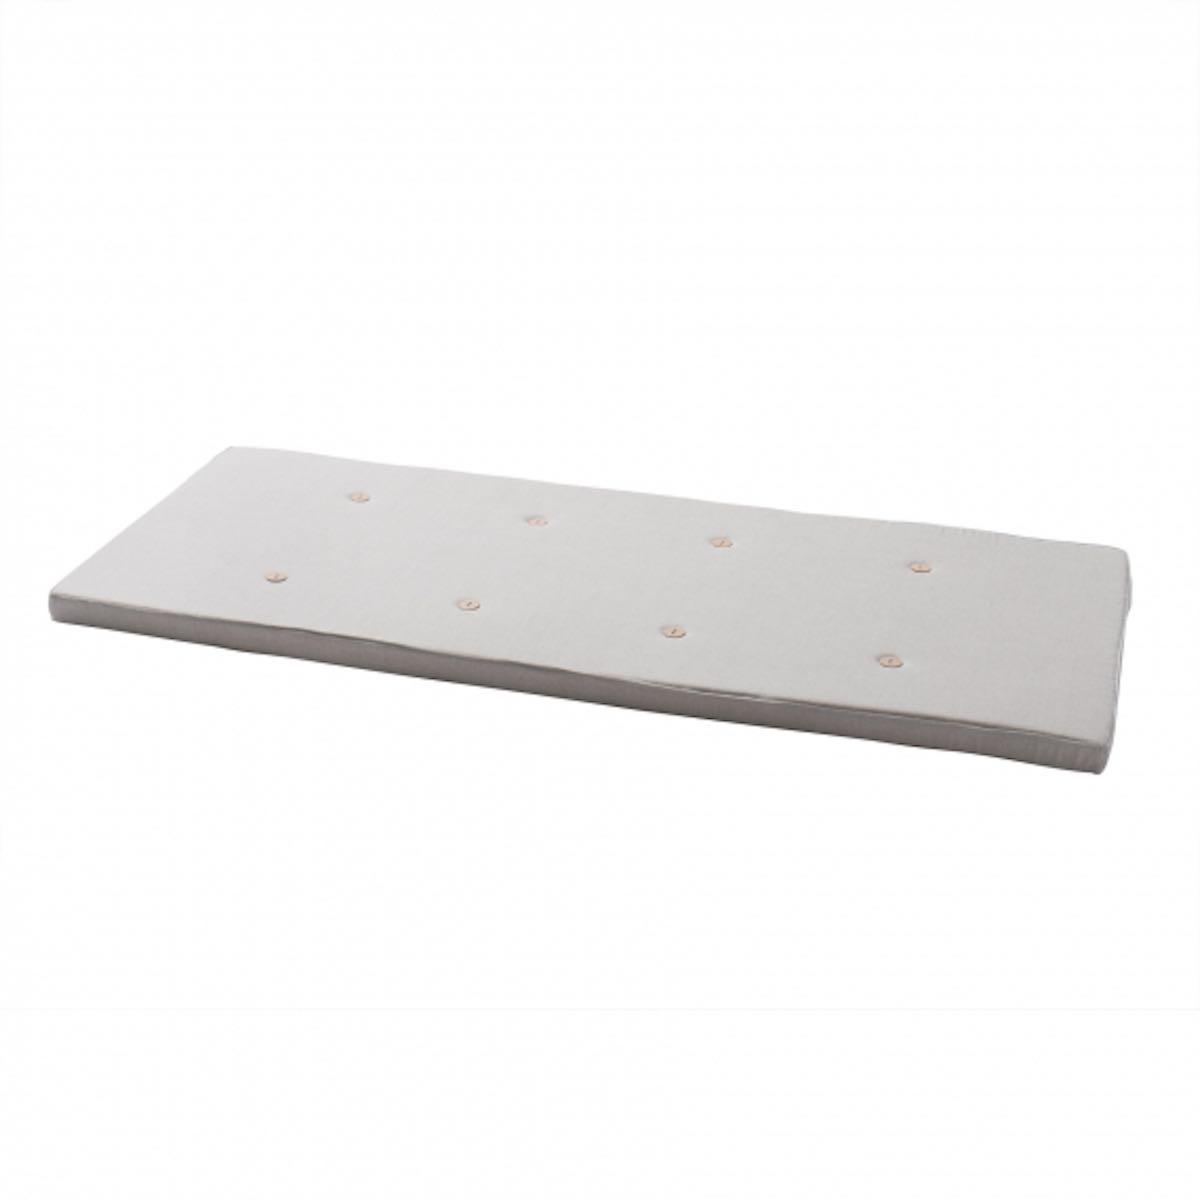 Colchón juegos 68x168cm cama media-alta SEASIDE LILLE+ Oliver Furniture